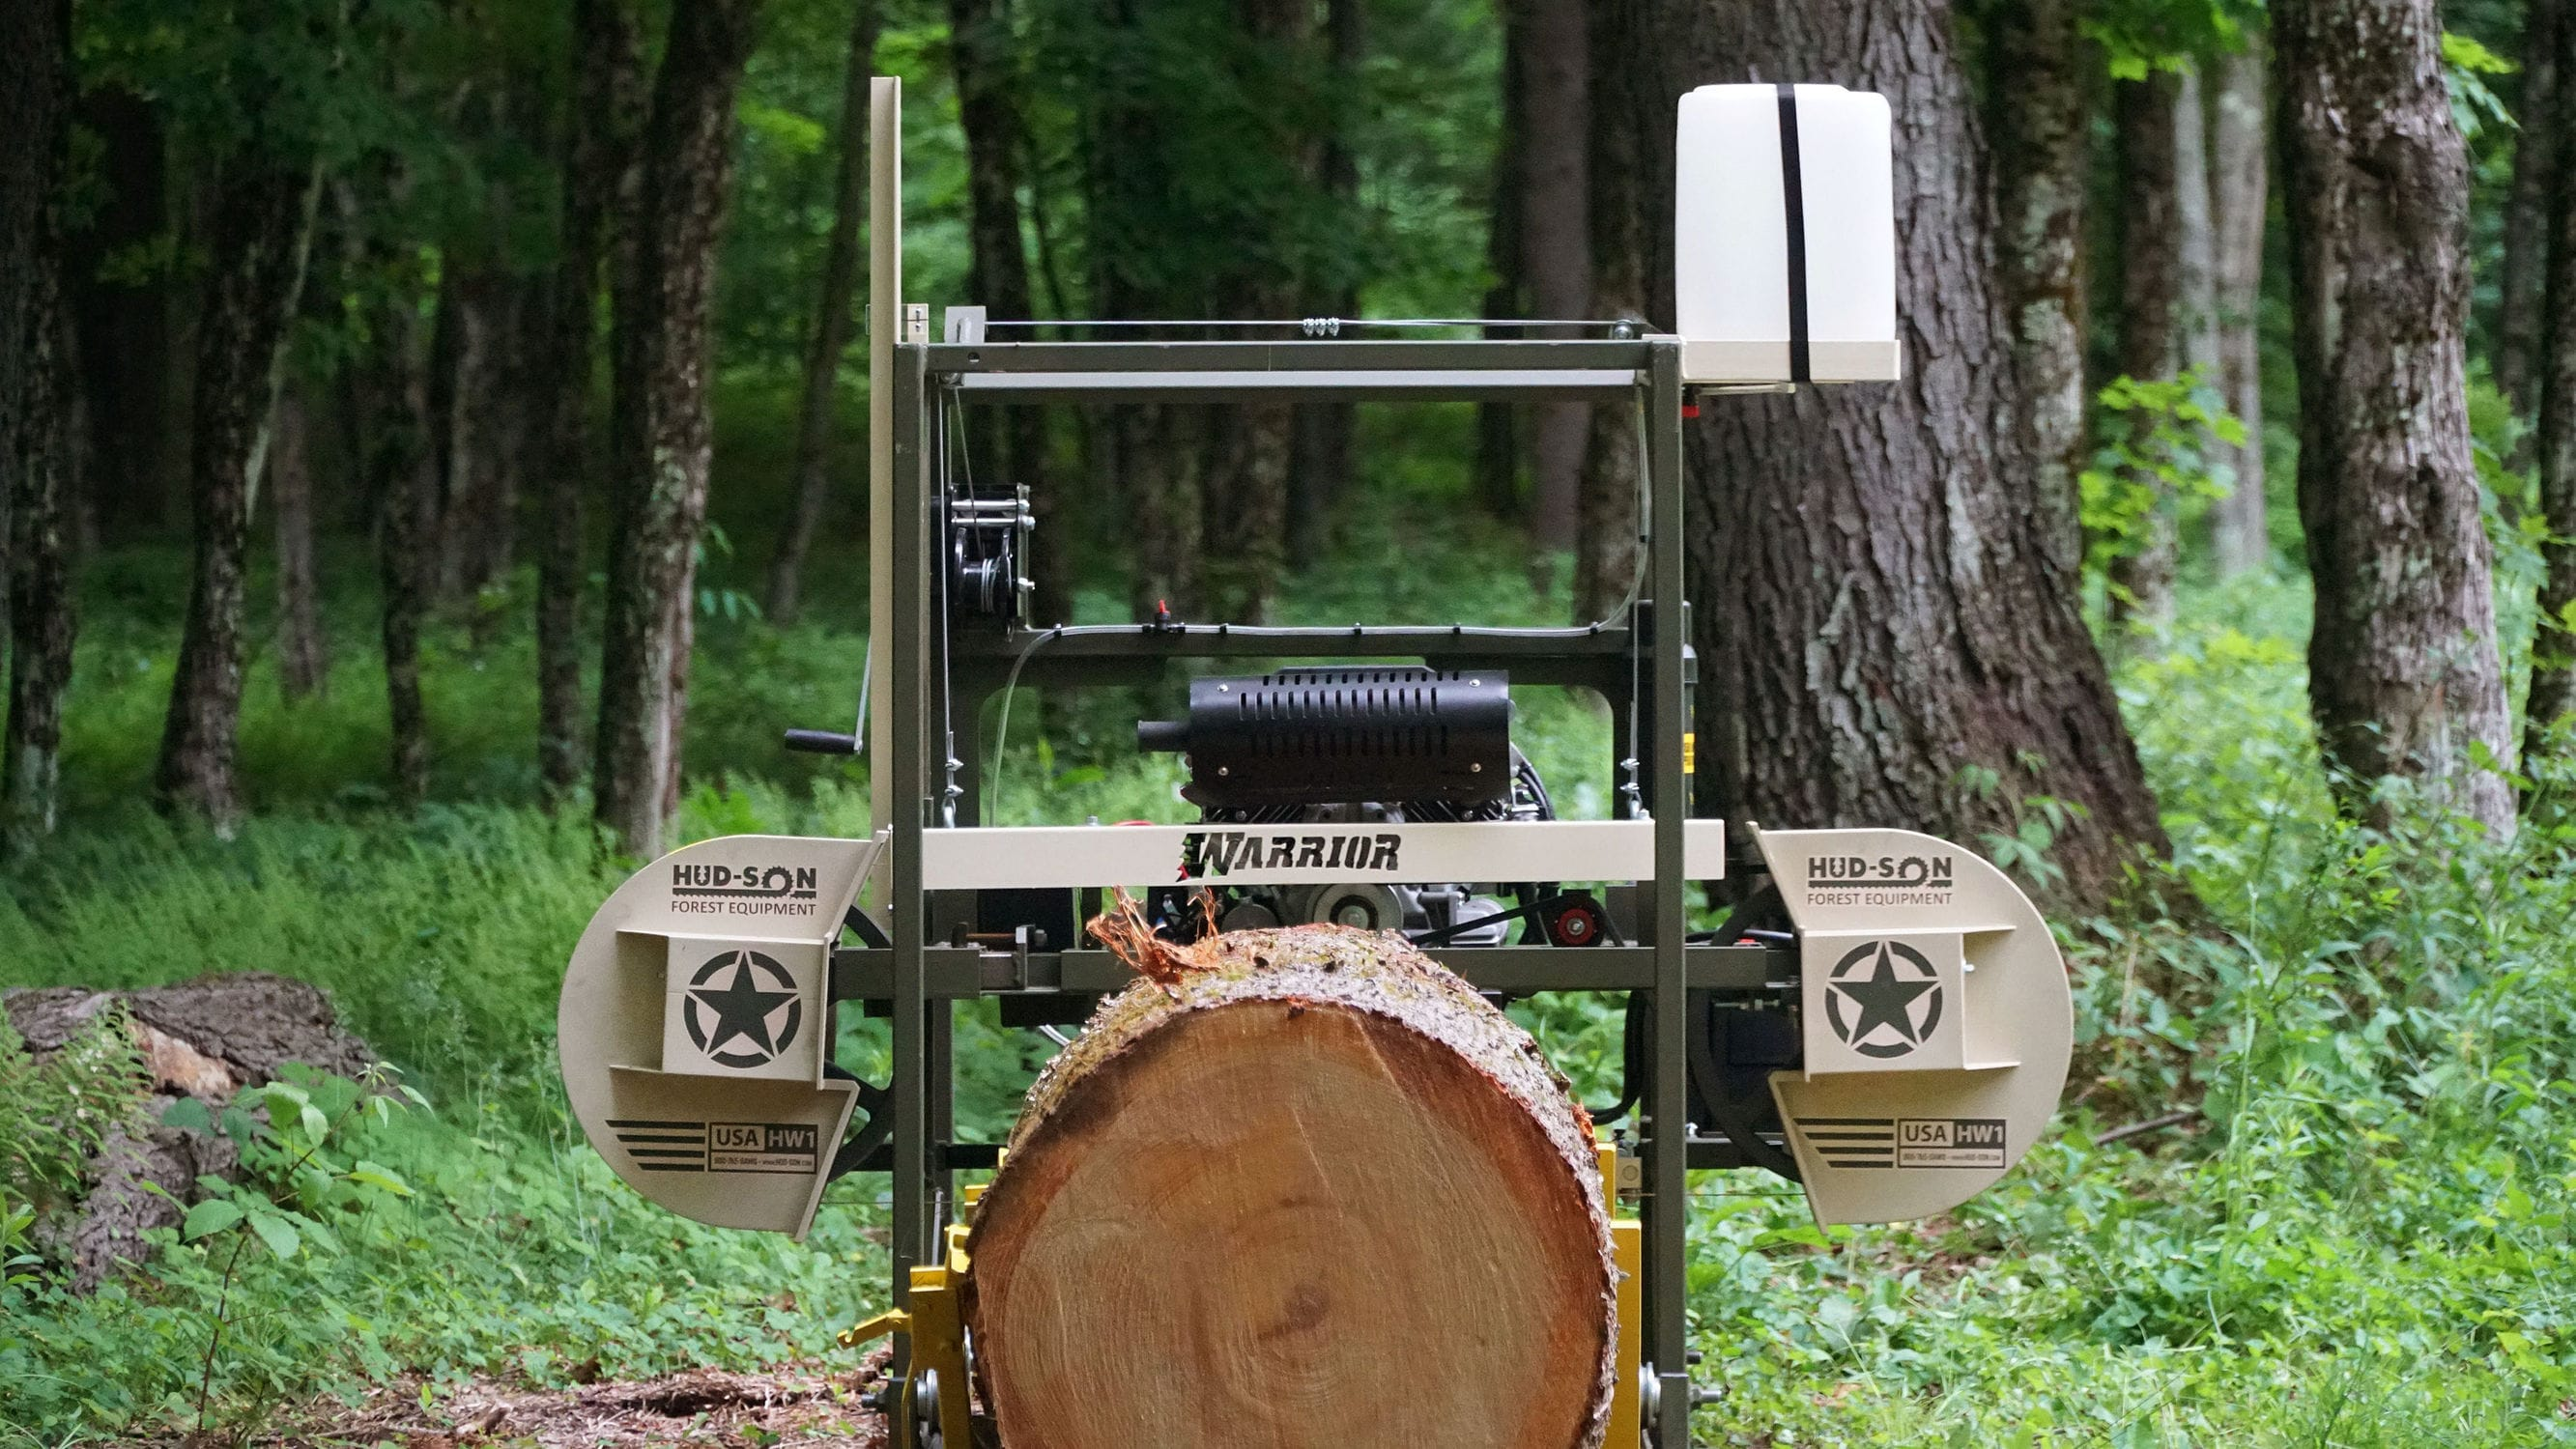 Portable sawmill / gasoline engine - WARRIOR - hud-son - Videos